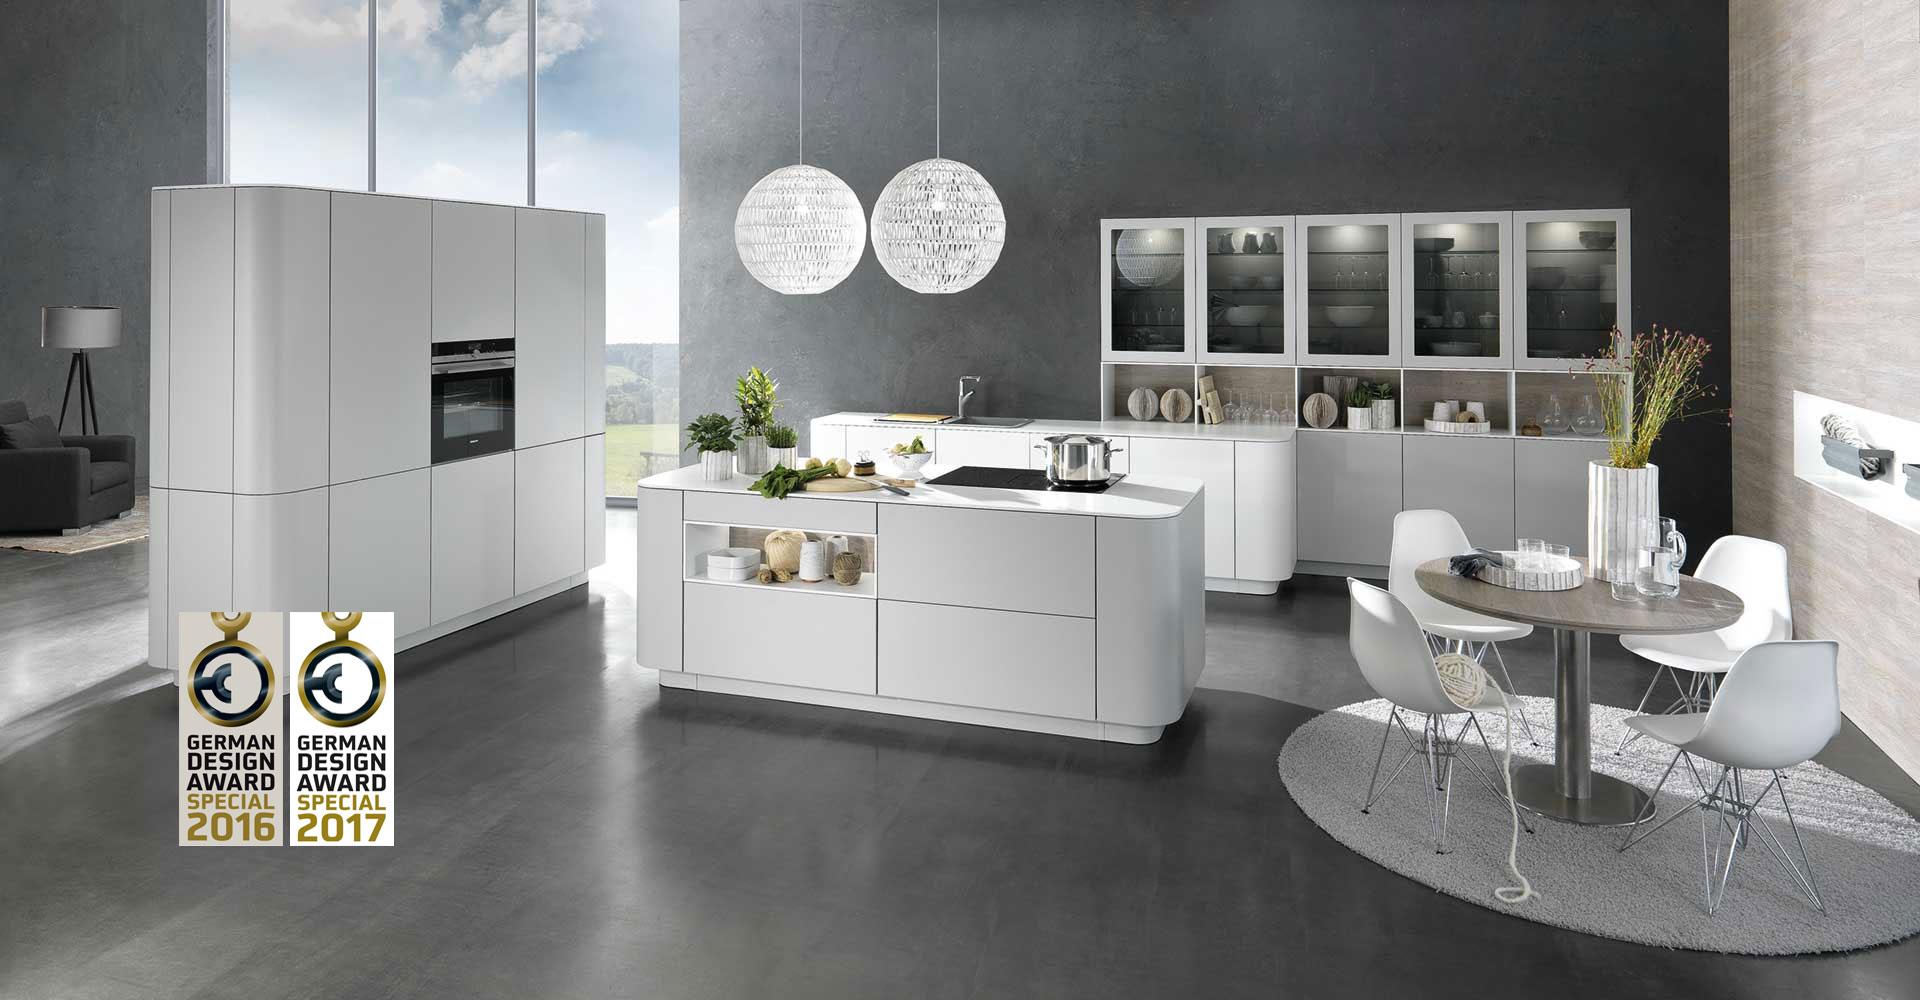 Rational kitchens award winning german kitchen furniture for Kitchen designs lancashire